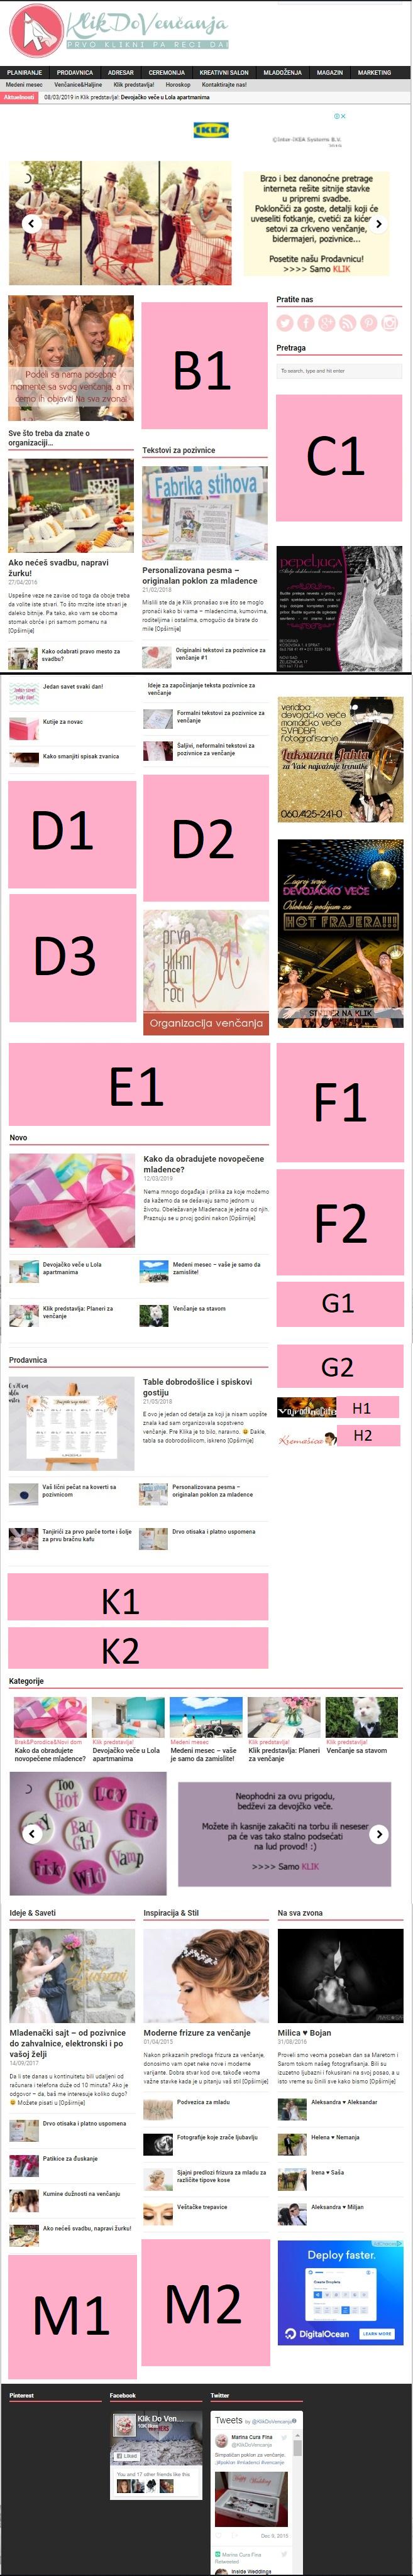 klik-oglasavanje